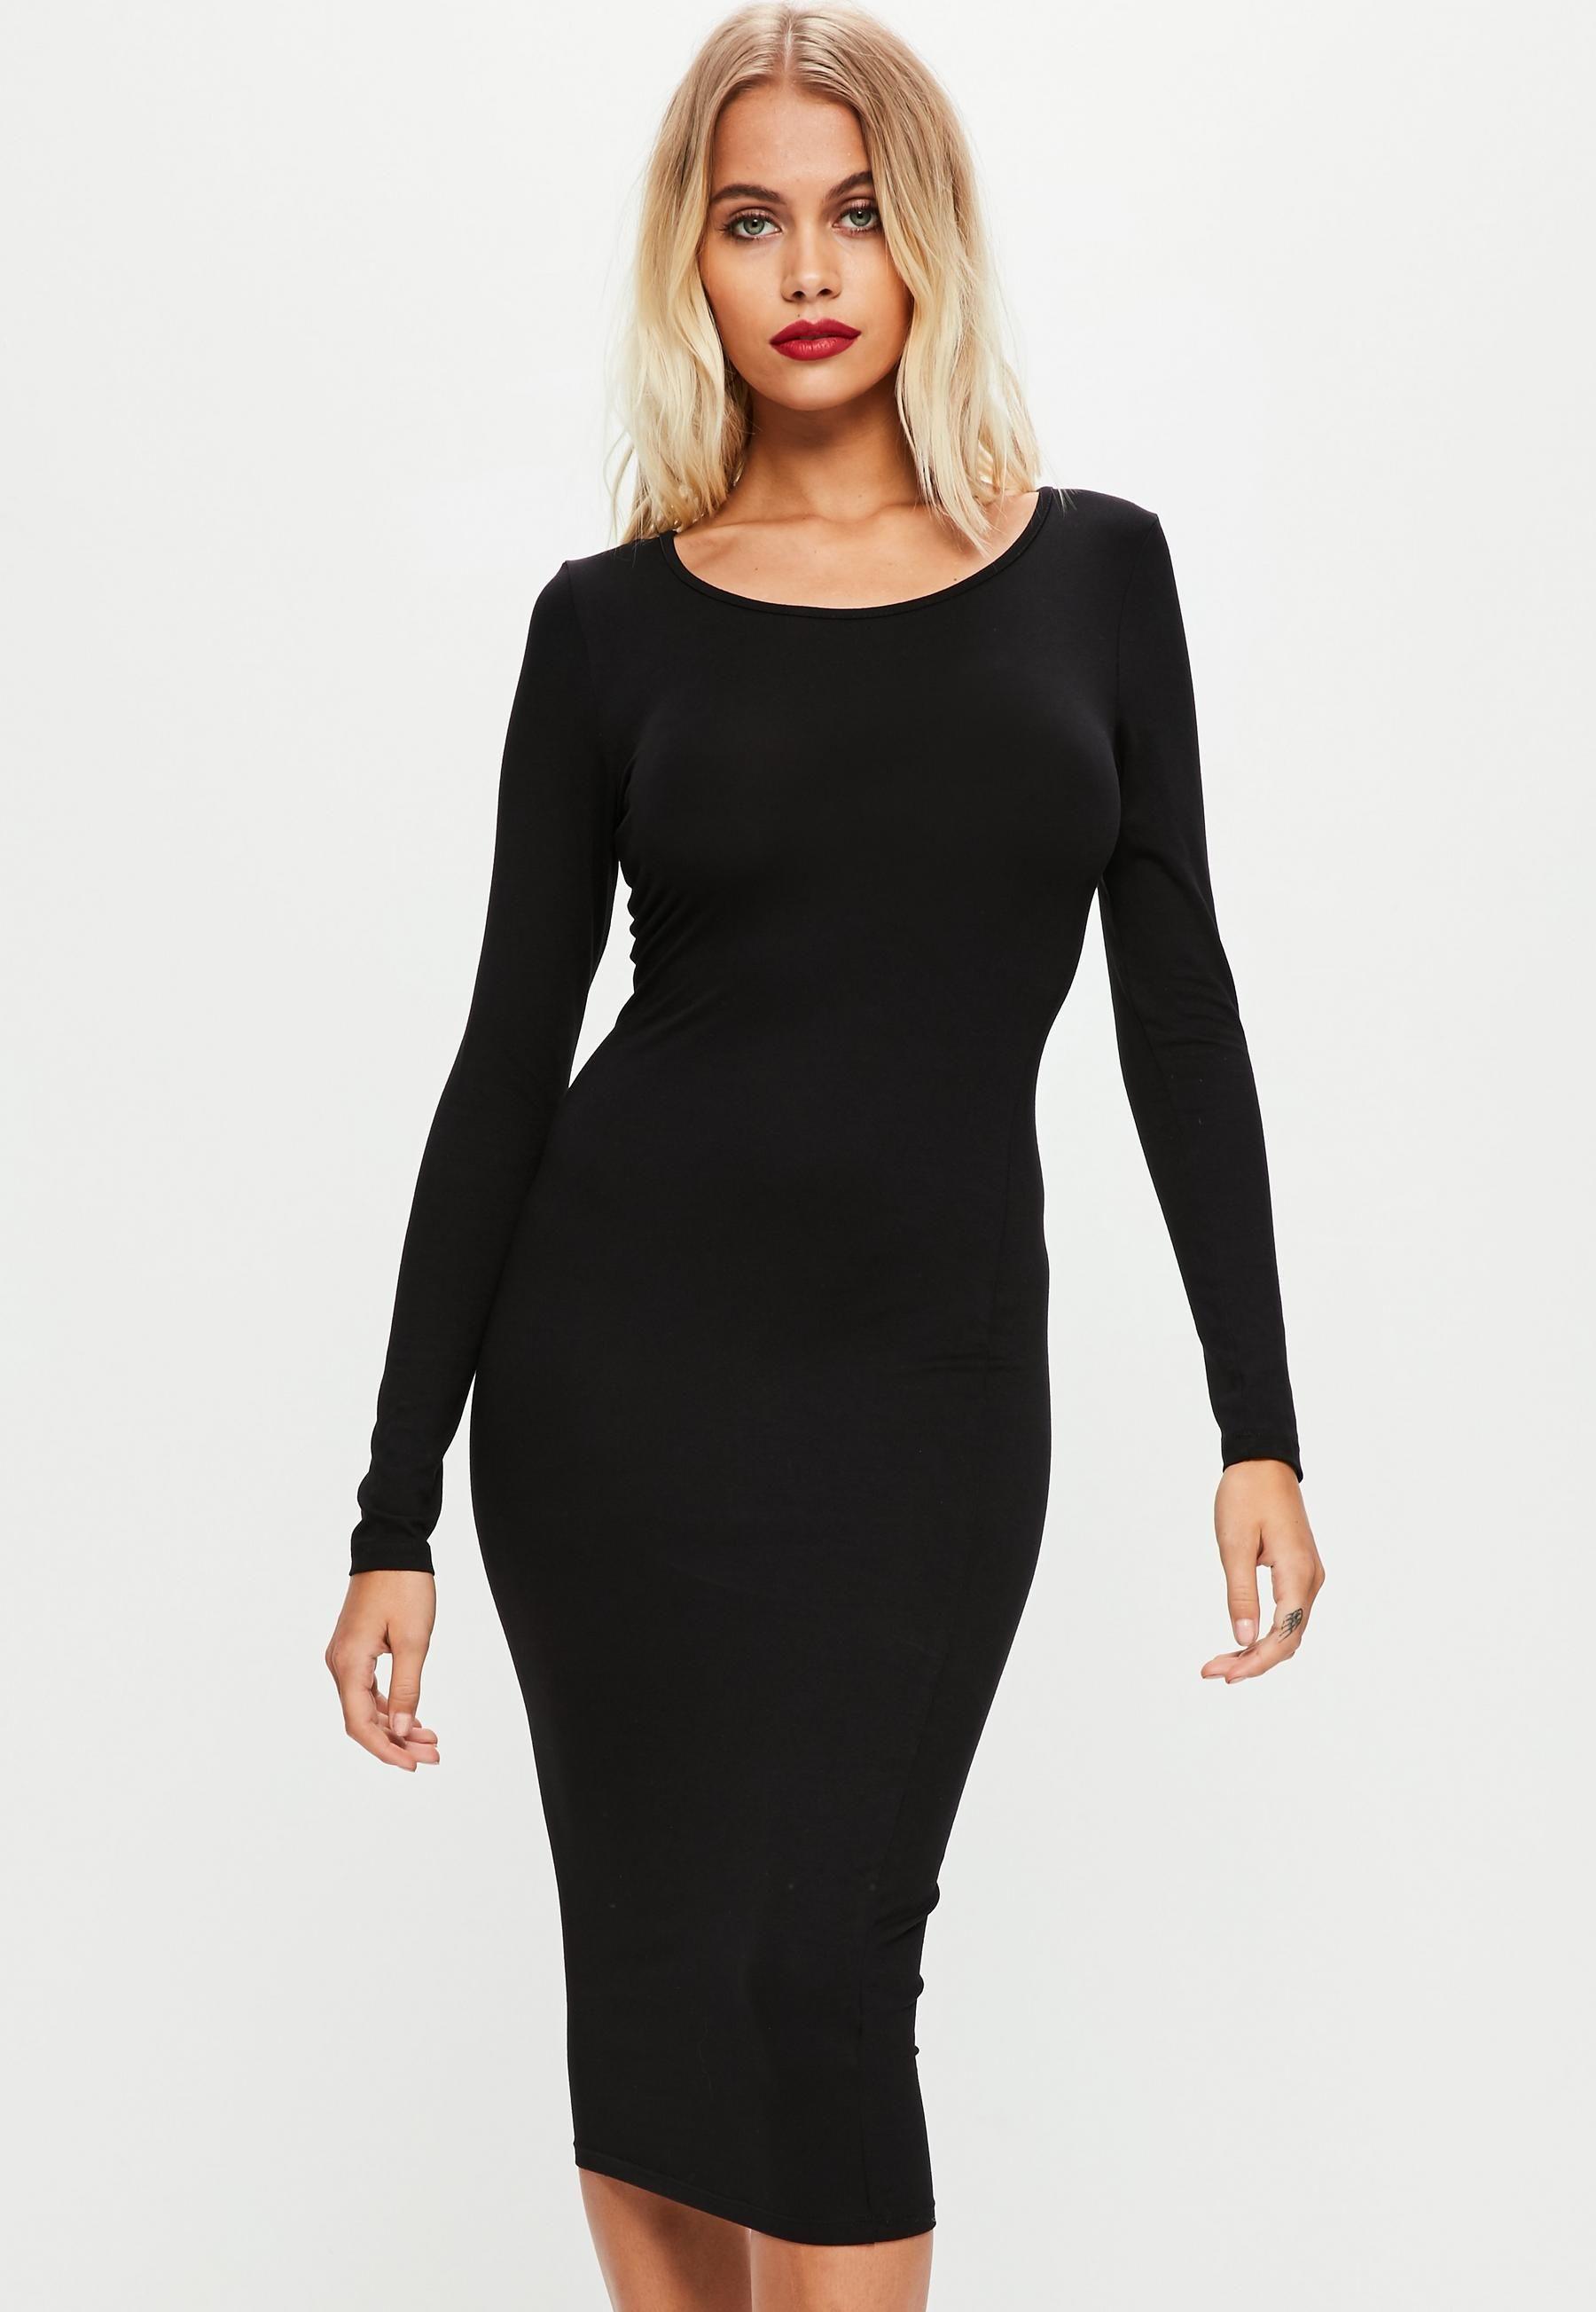 b8211f33a0584 Black Long Sleeve Plain Midi Bodycon Dress | Missguided | Clothes ...